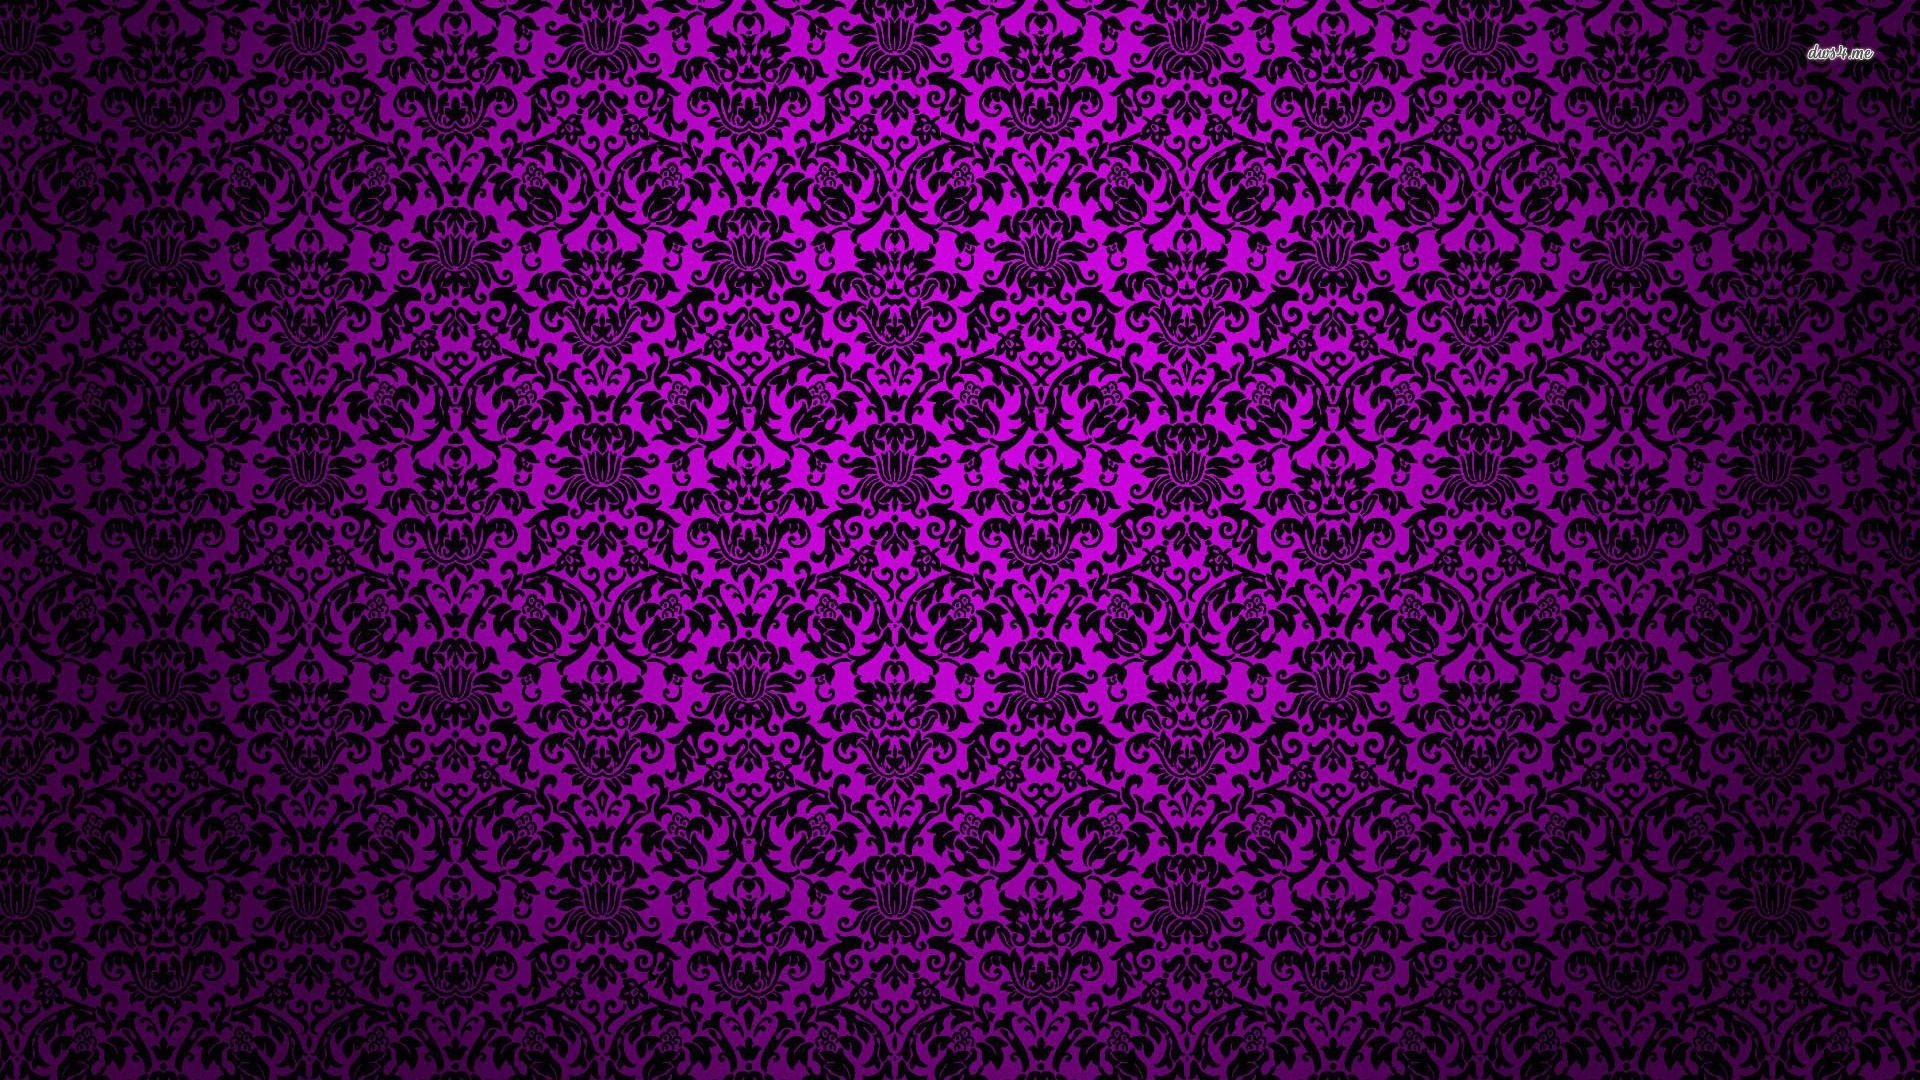 wallpaper patterns | Purple Vintage Pattern wallpapers HD ... - photo#40